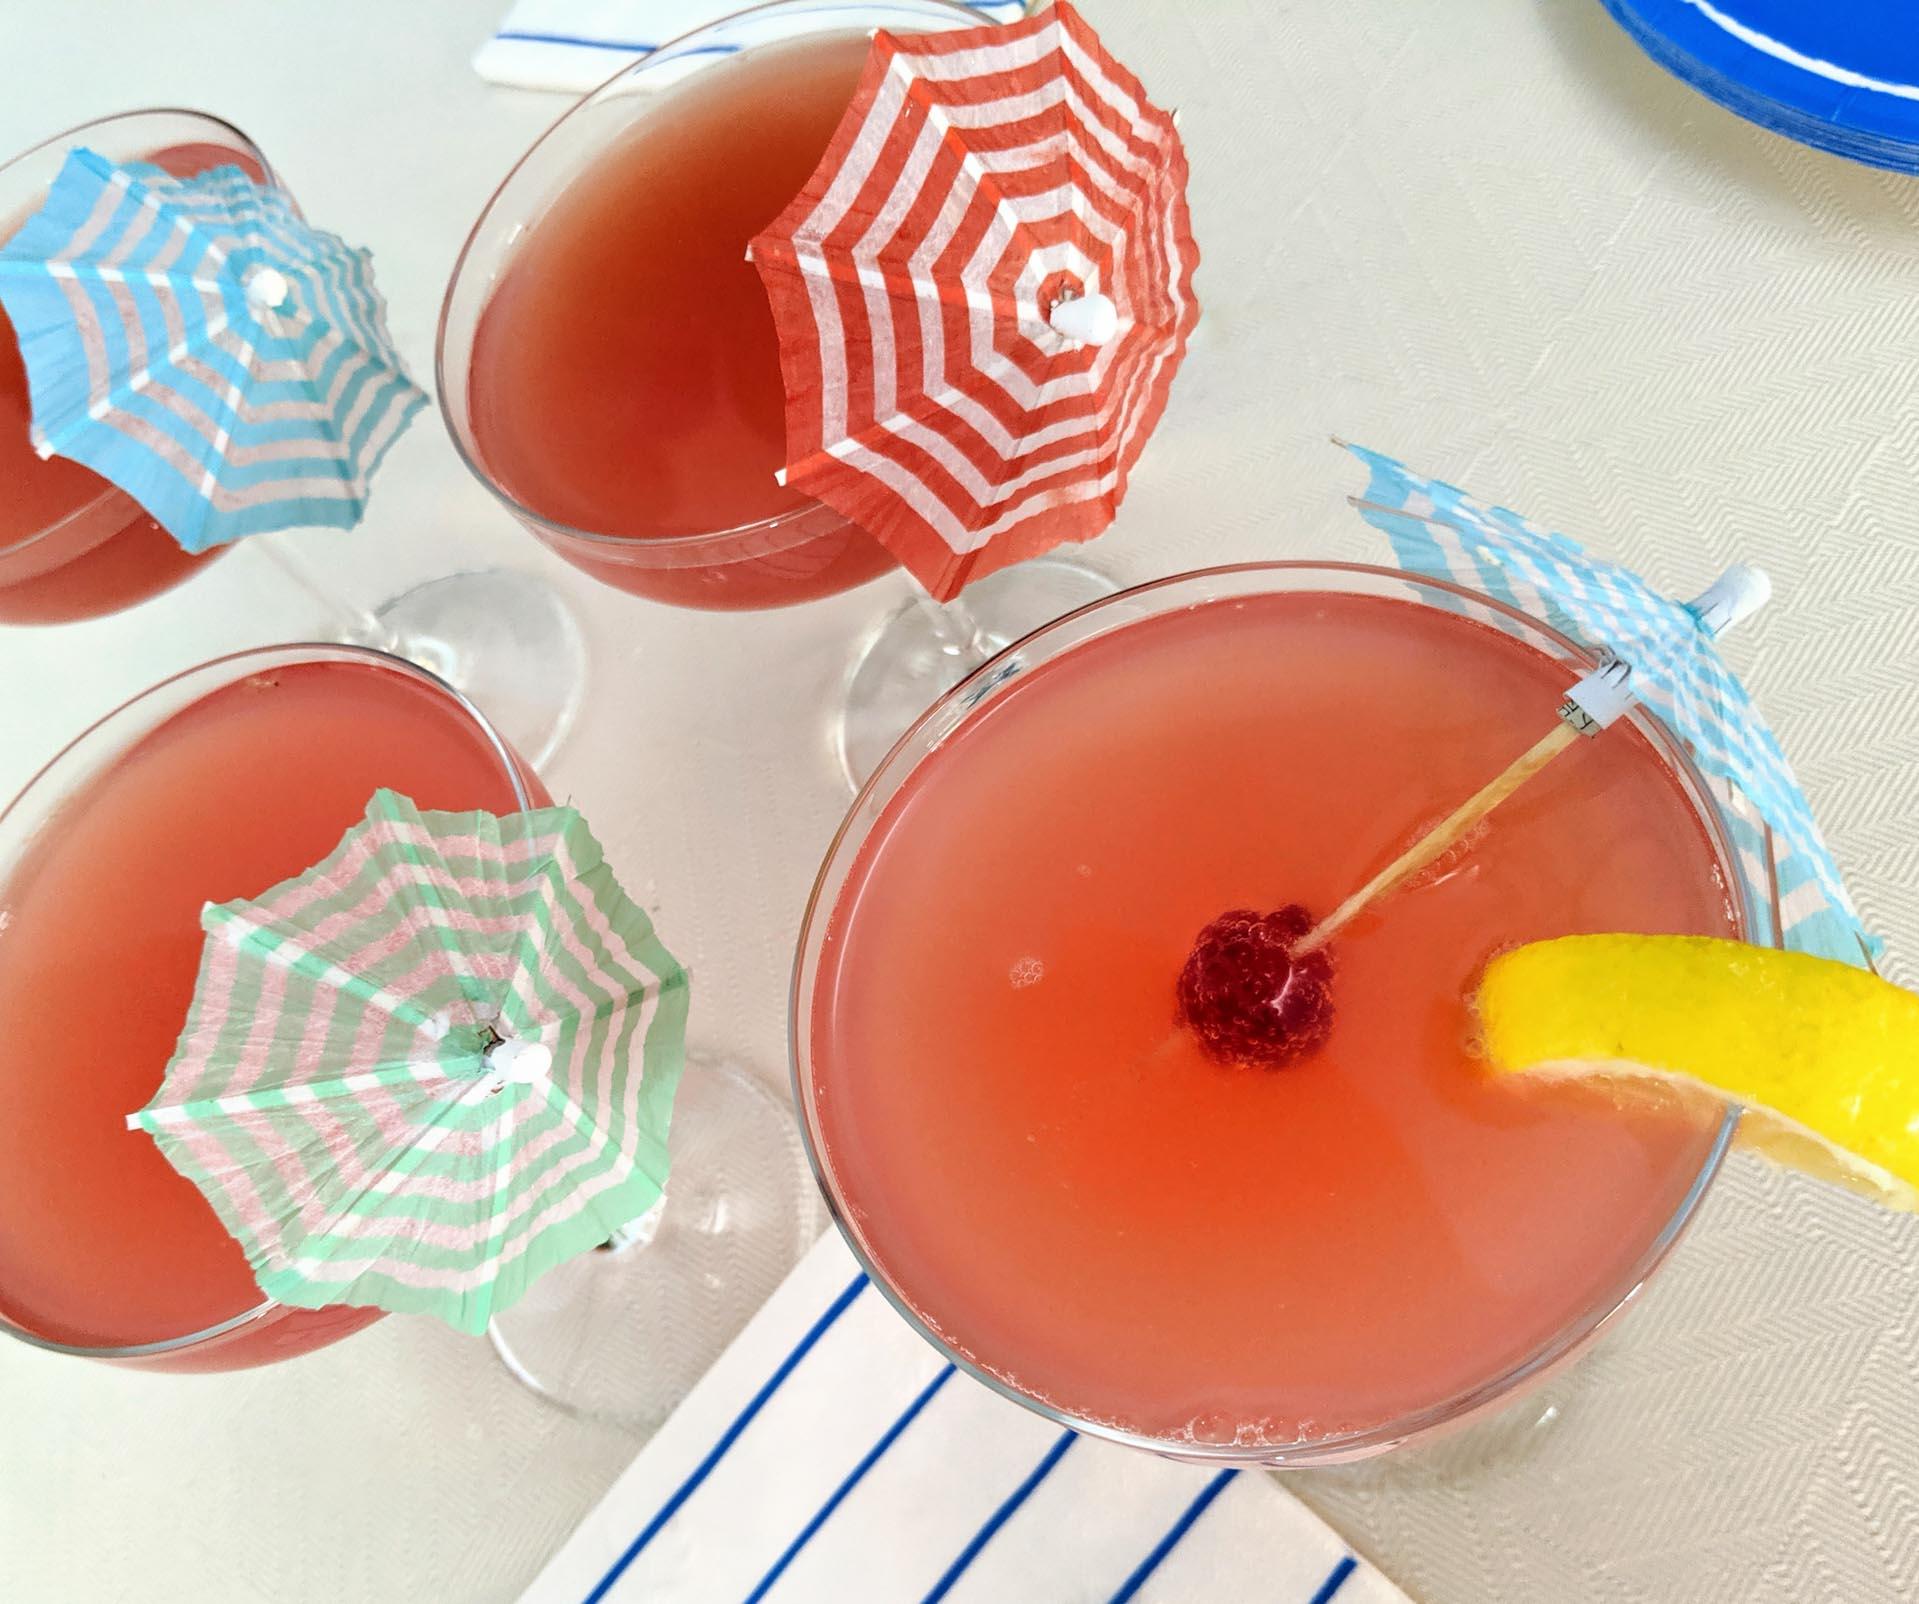 Blood orange mimosa cocktail